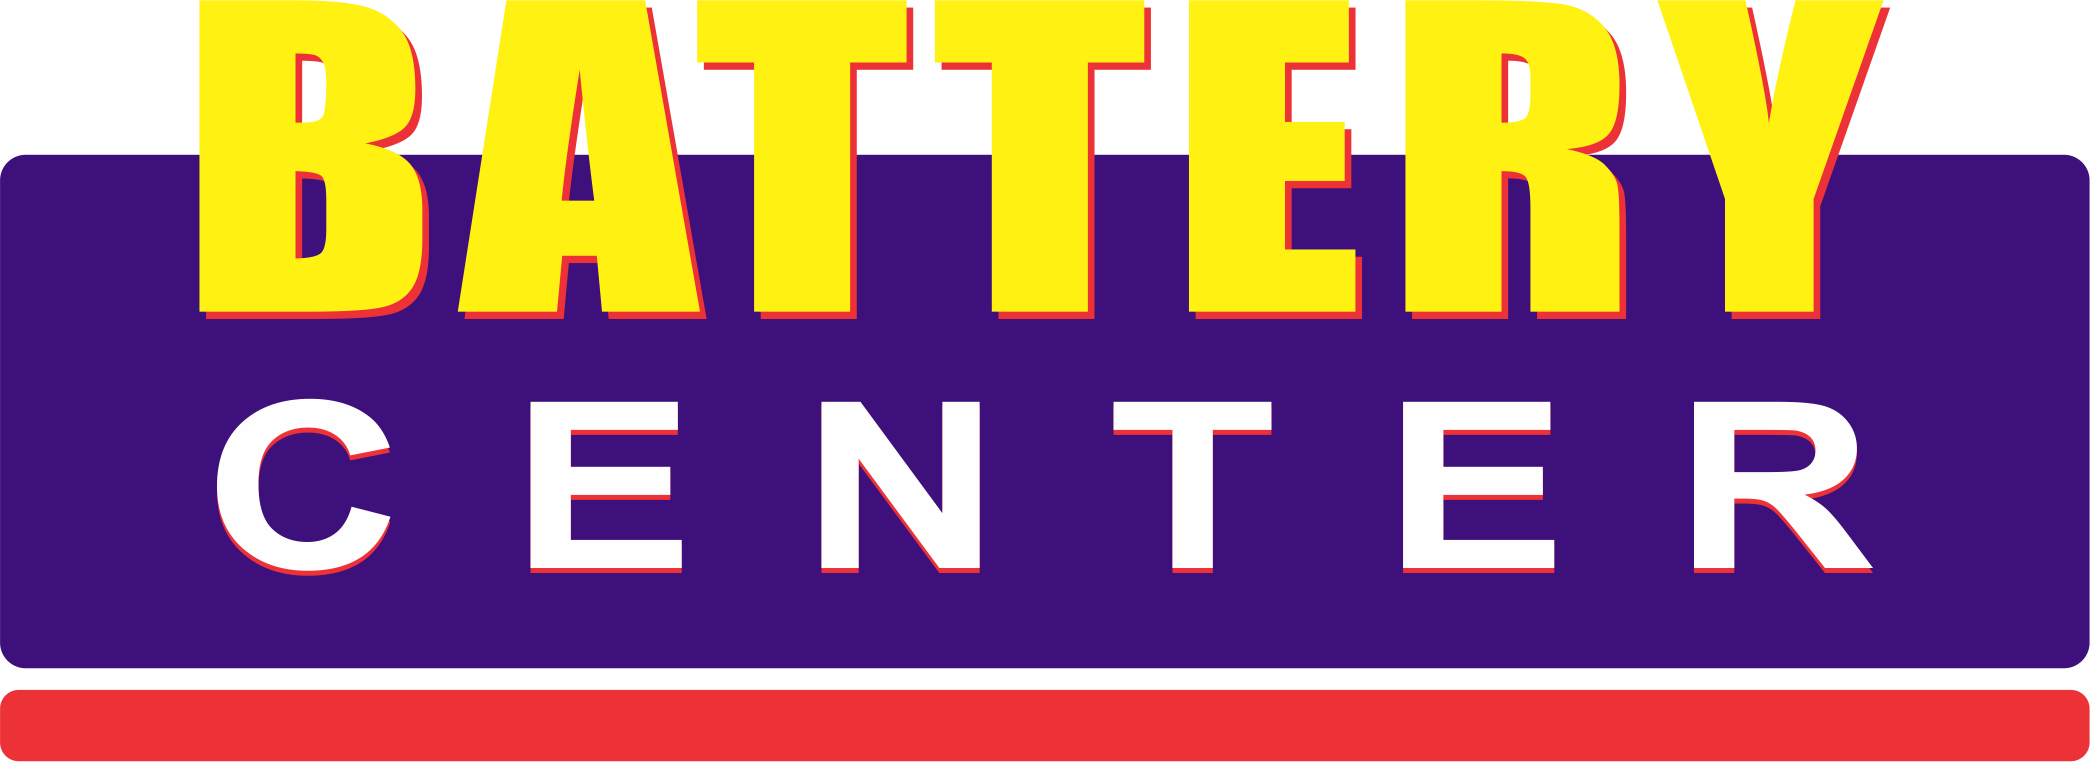 Battery Center - Baterias Heliar